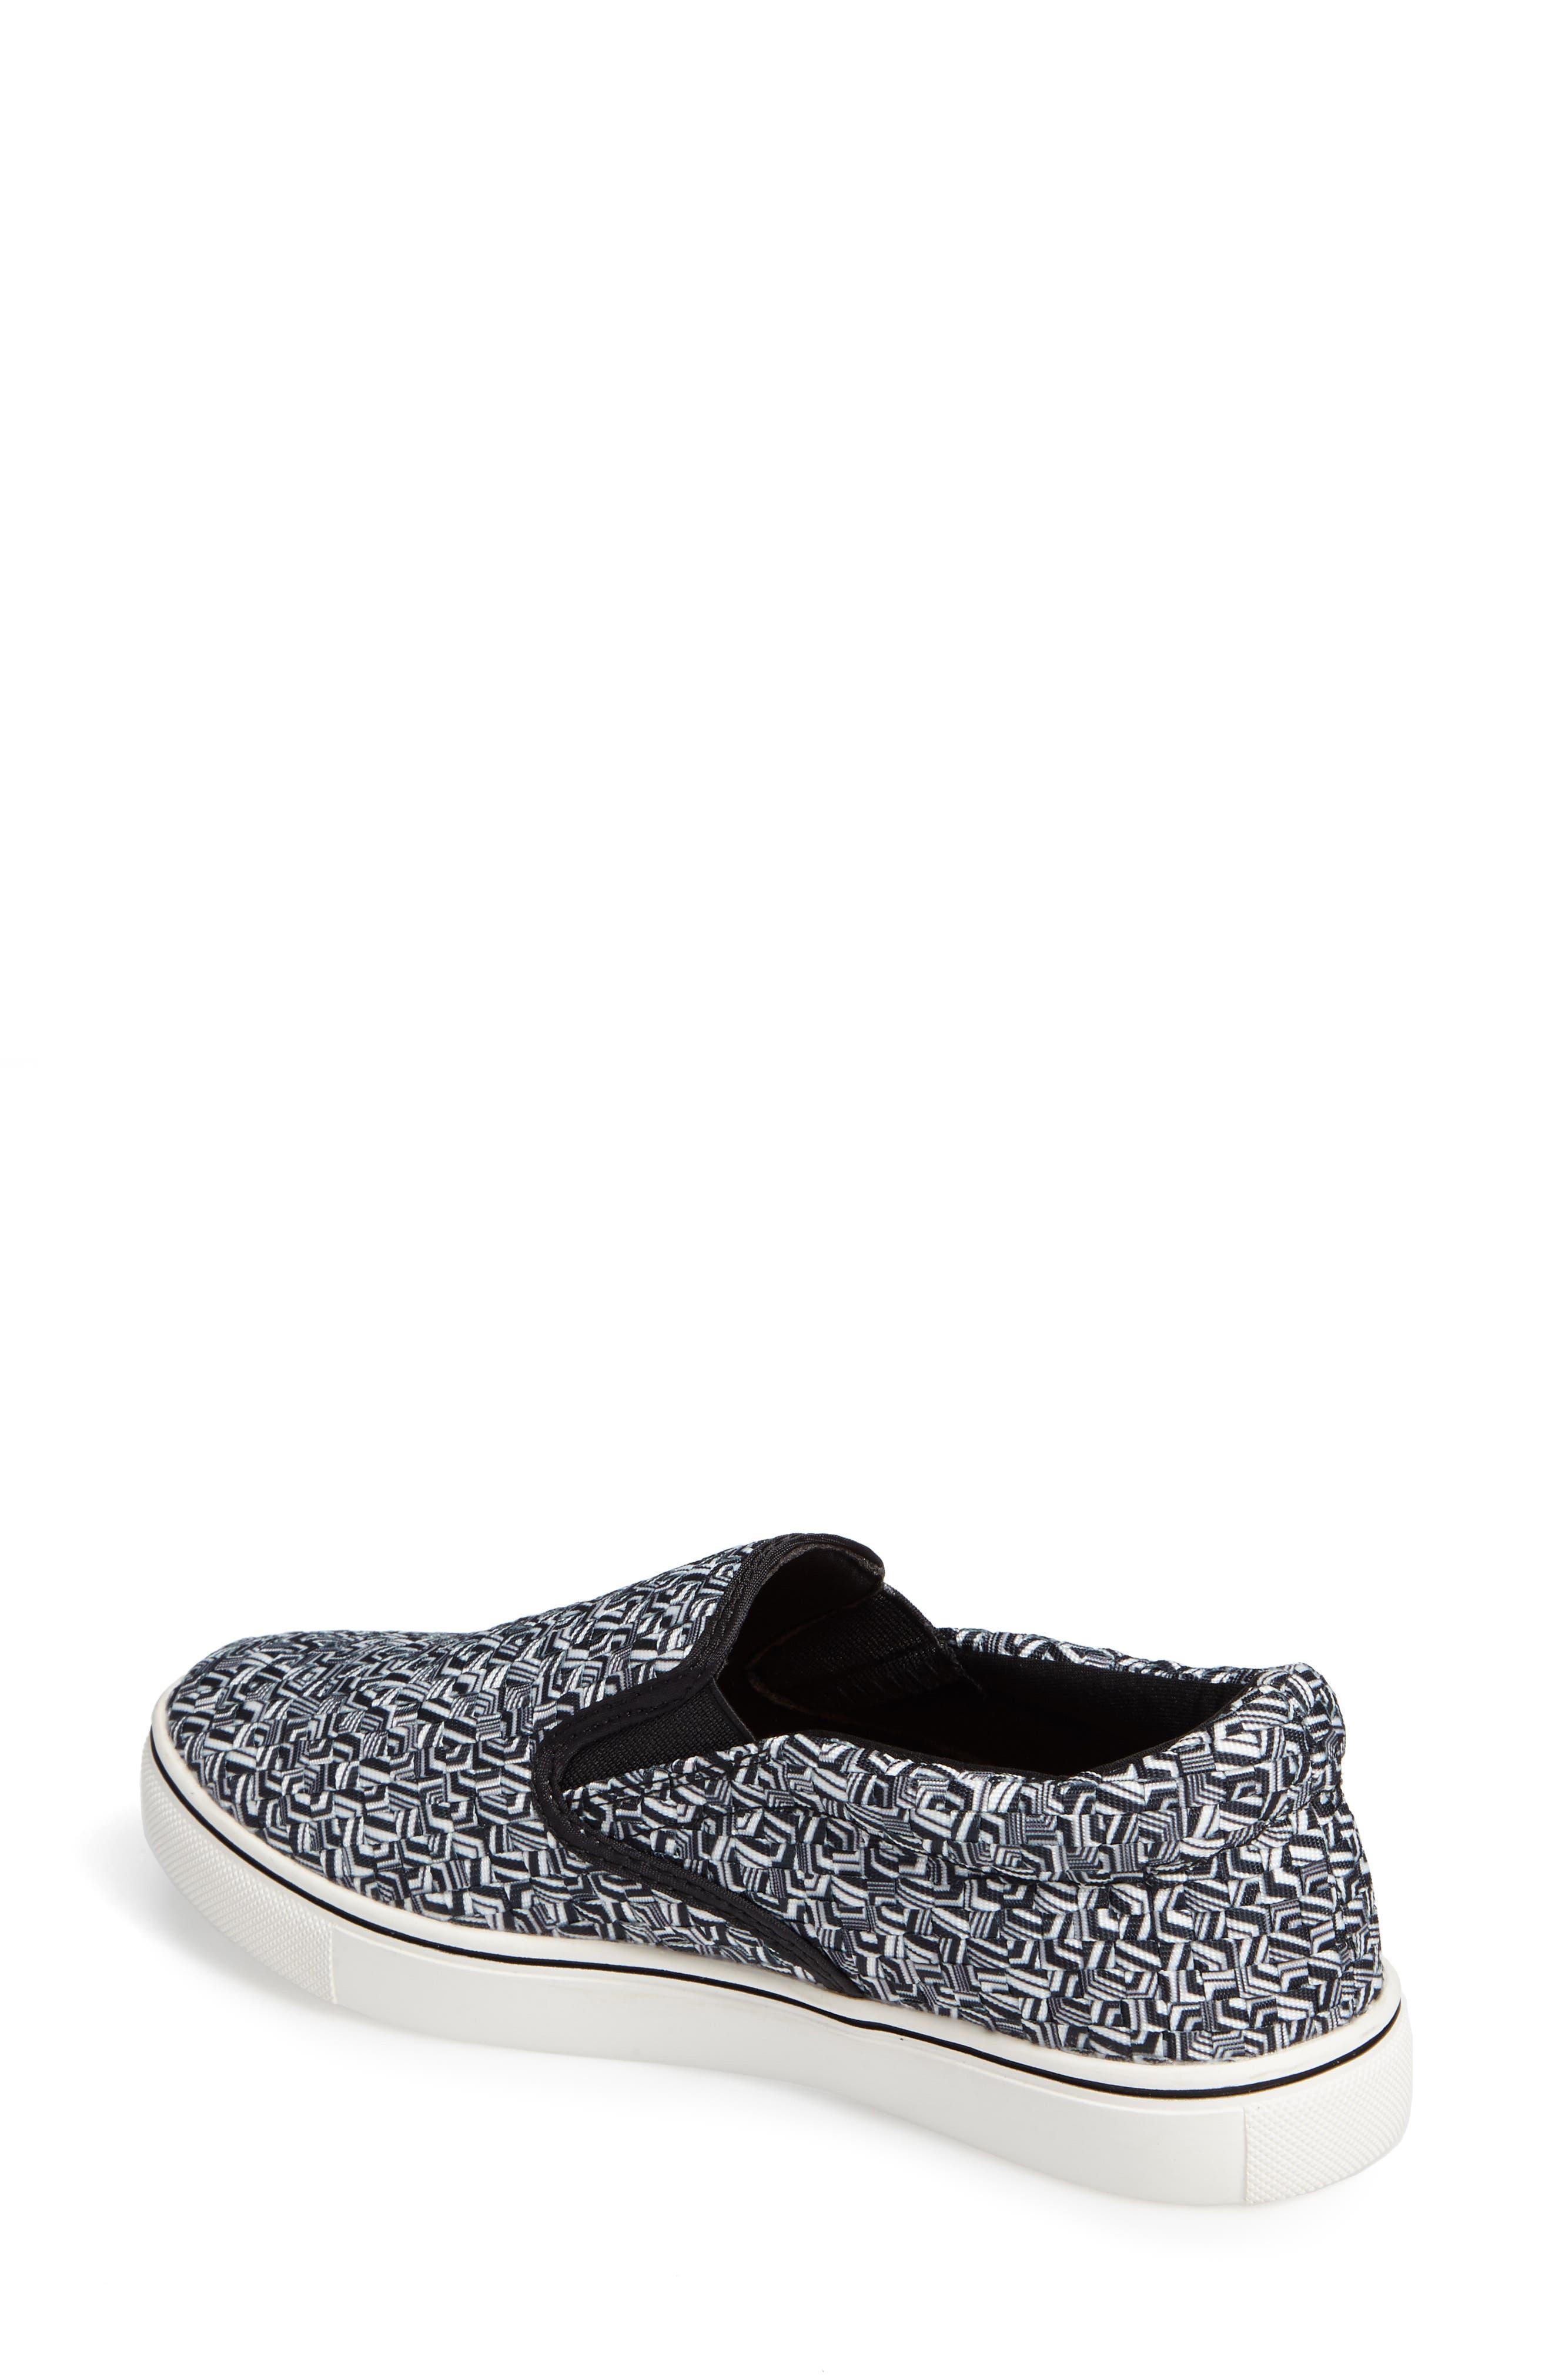 'Verona' Slip-On Sneaker,                             Alternate thumbnail 2, color,                             MARBLE FABRIC